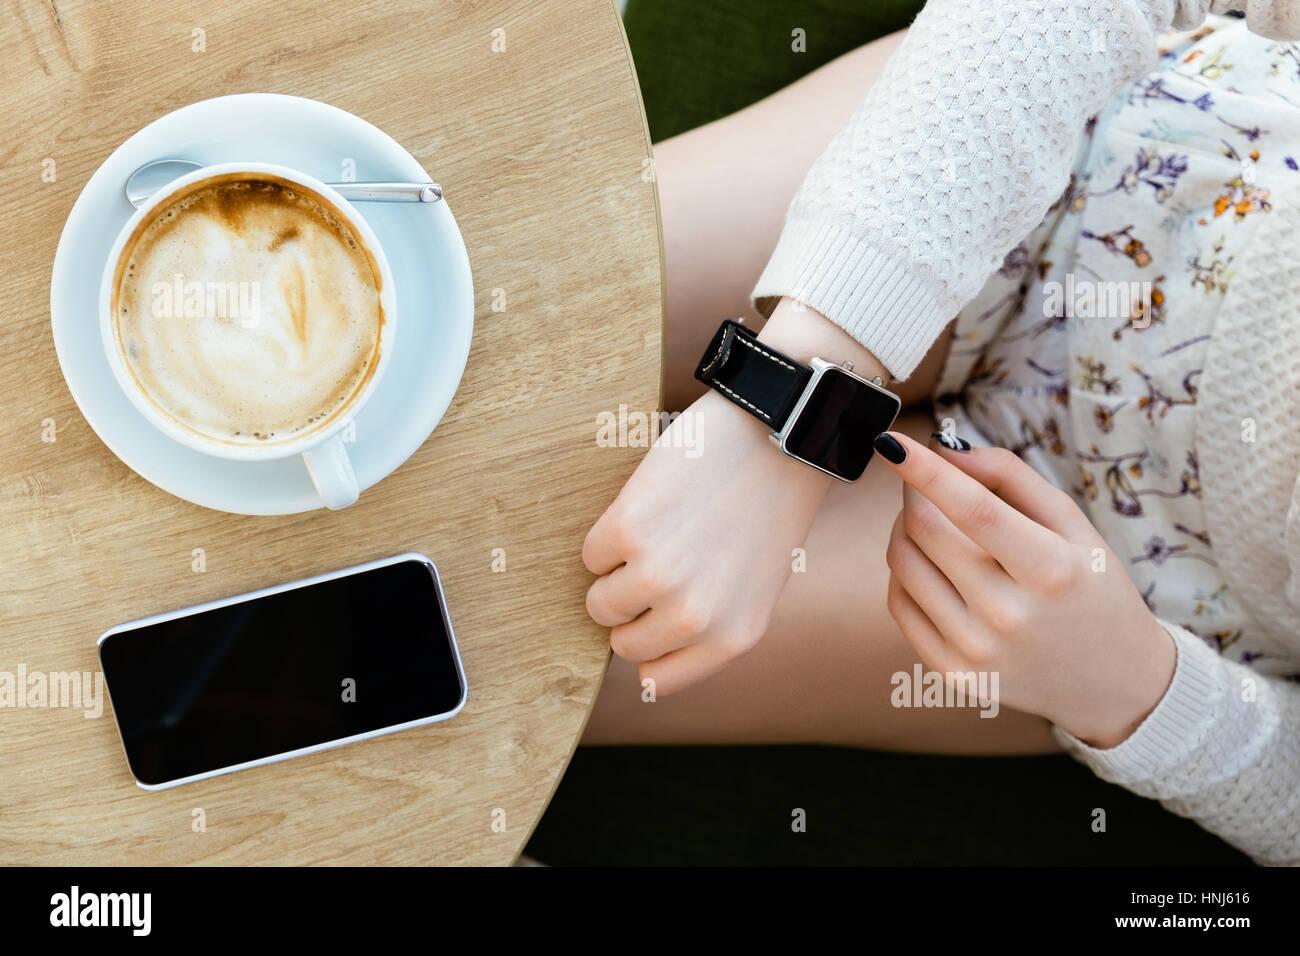 Taza de café, reloj y teléfono móvil Imagen De Stock